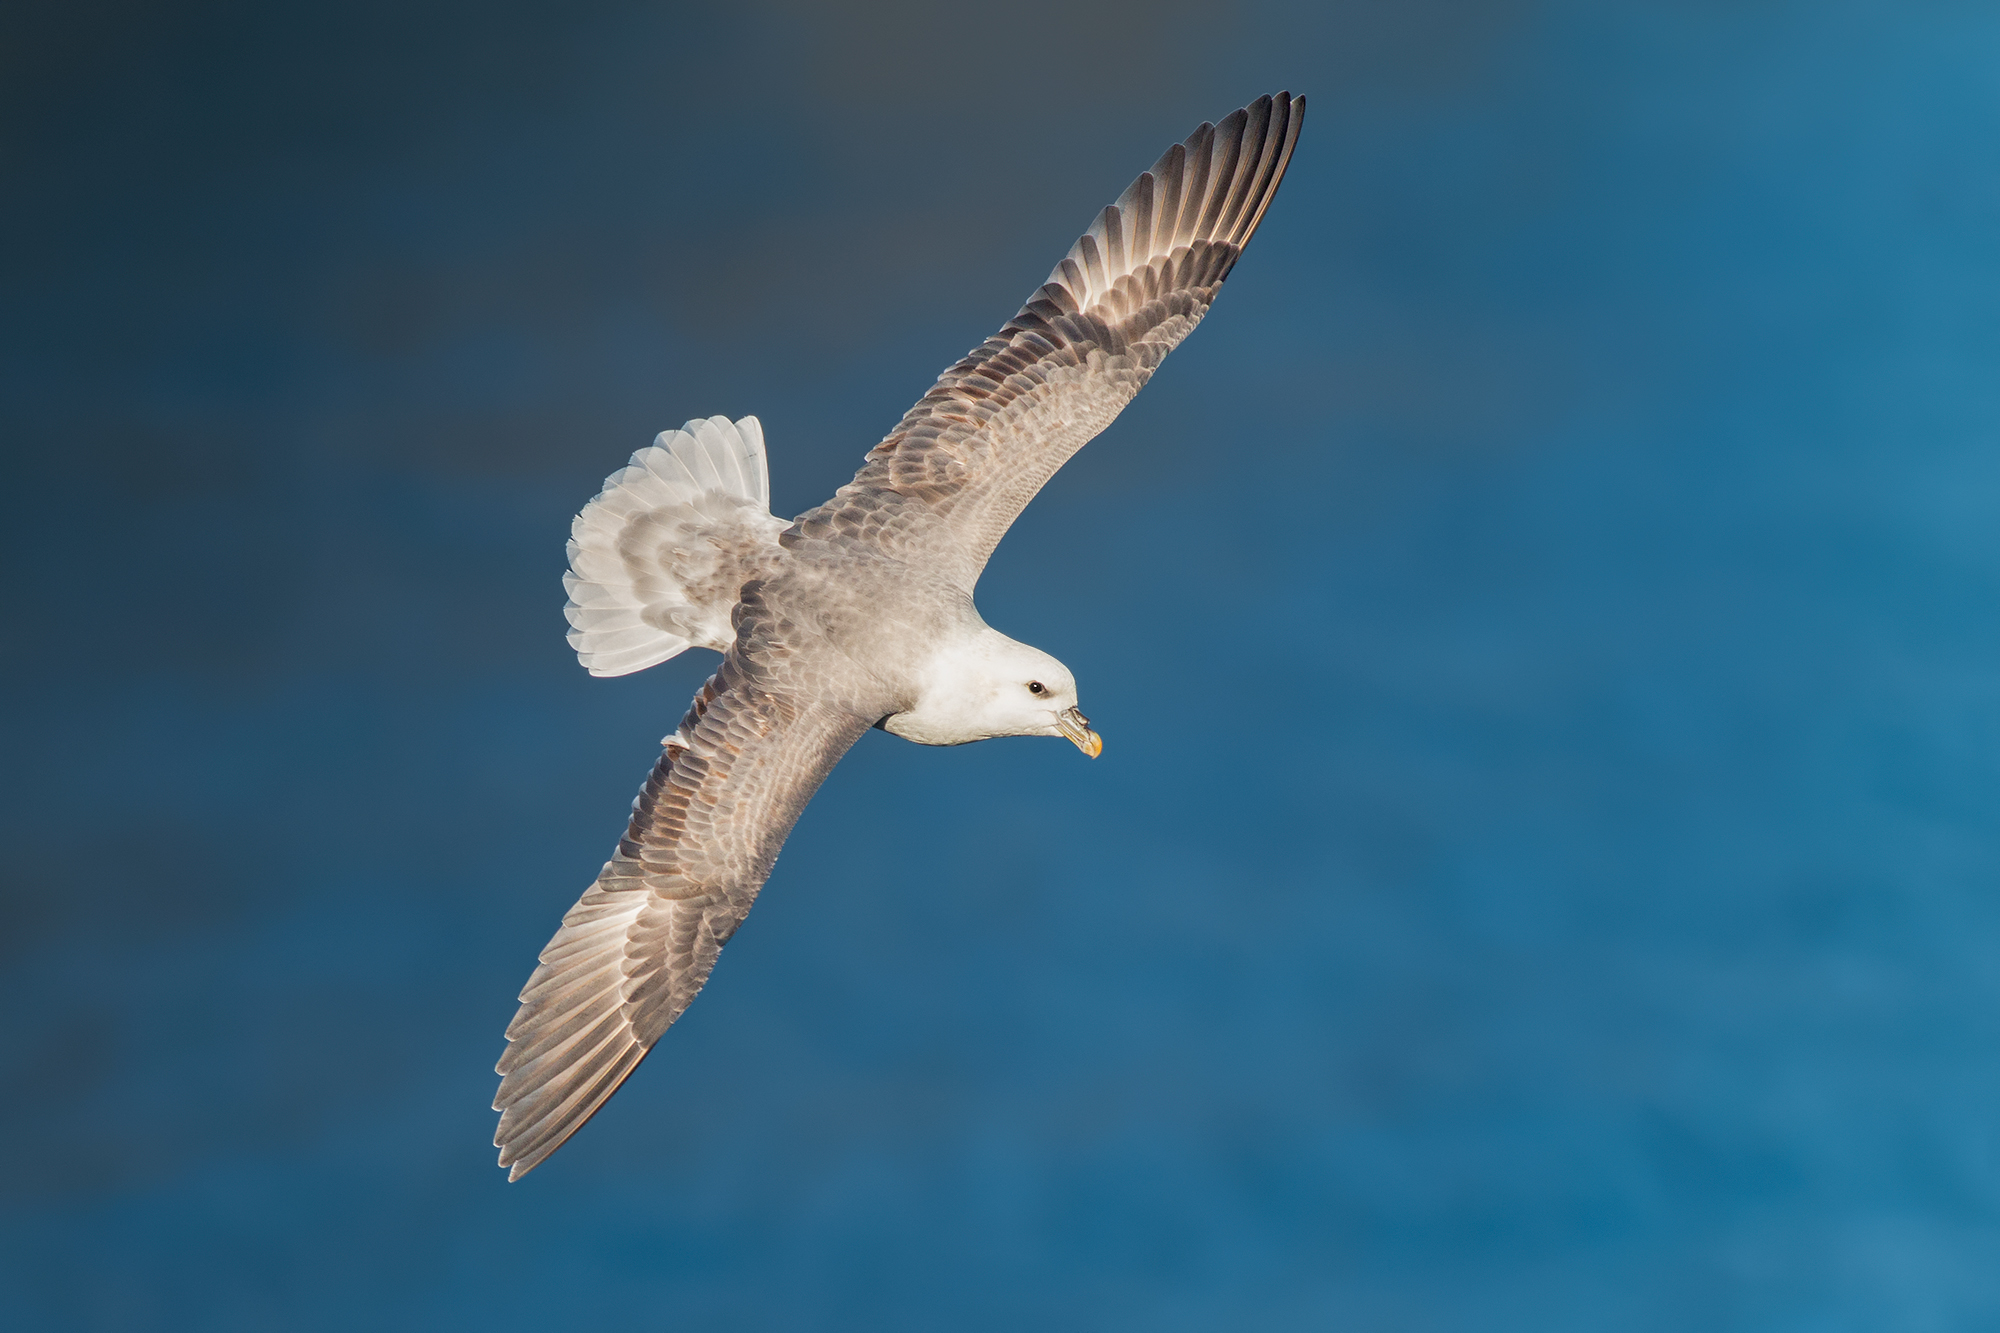 Stormfågel-JPEG_web 16.jpg